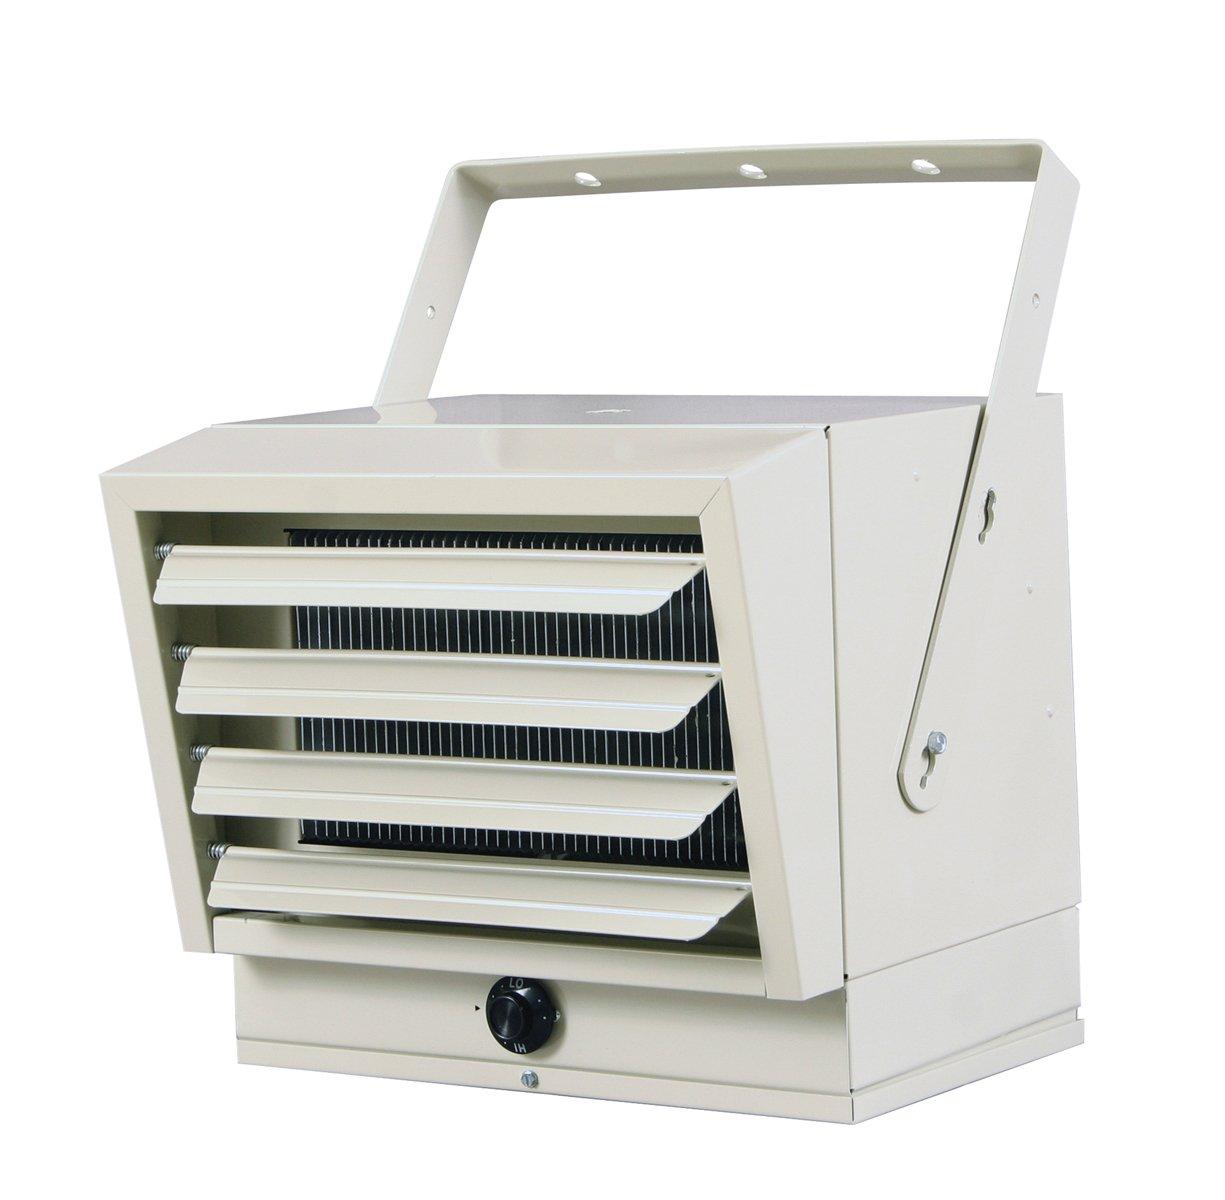 Fahrenheat FUH724 240-volt Garage Heater, 3750-7500-watt